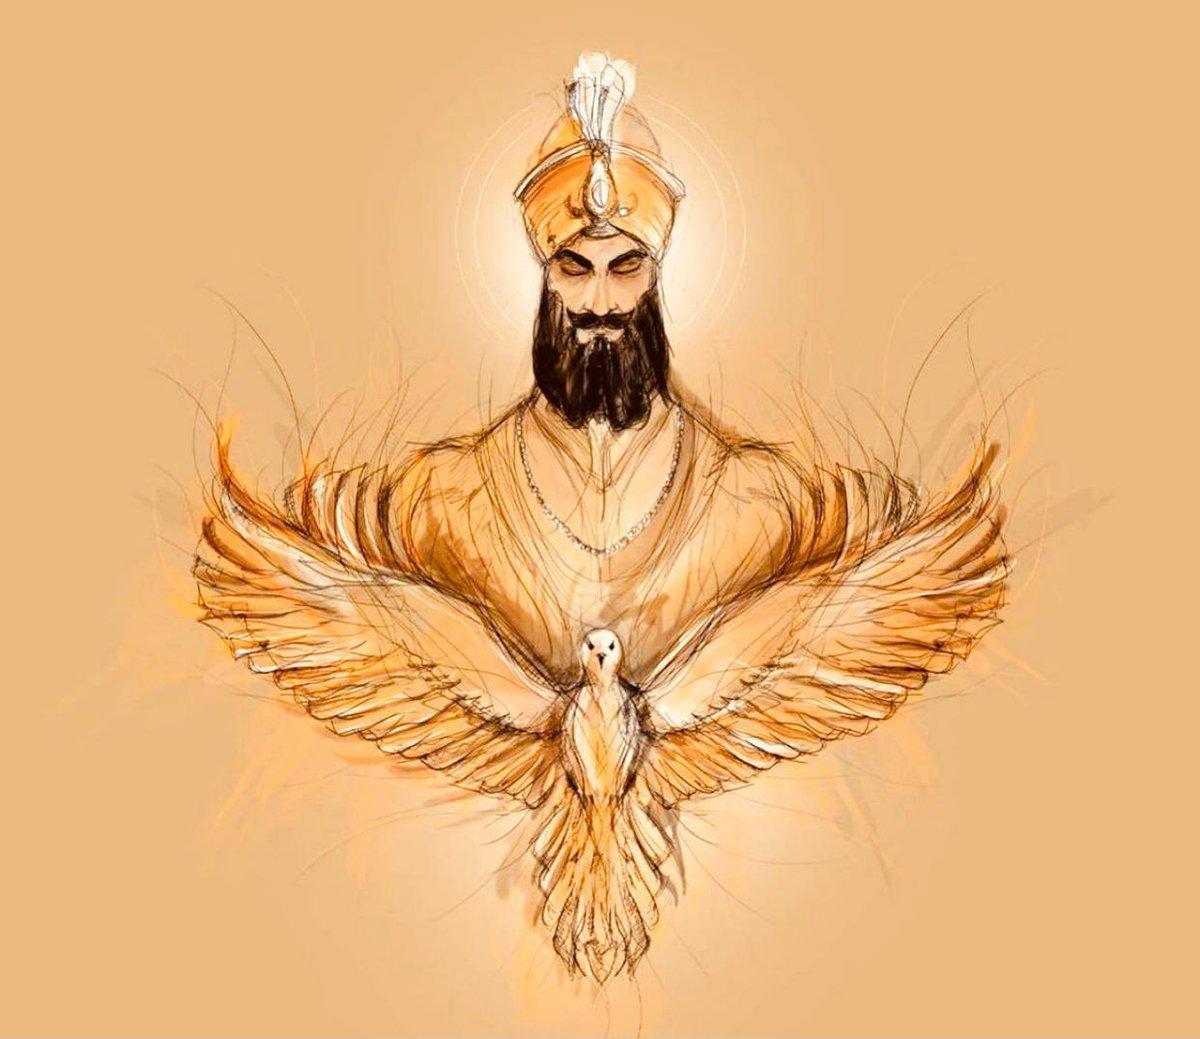 मानस की जात सभौ ईक्को ही पहचानबो ।।  गुरु गोबिंद सिंह जी 🙏🏽   Recognise the whole human race as one.  #gurugobindsinghji   #gurugobindsinghjayanti #खालसा_पंथ   #PrakashPurab 🙏🏽 https://t.co/F01WIl7ZaX